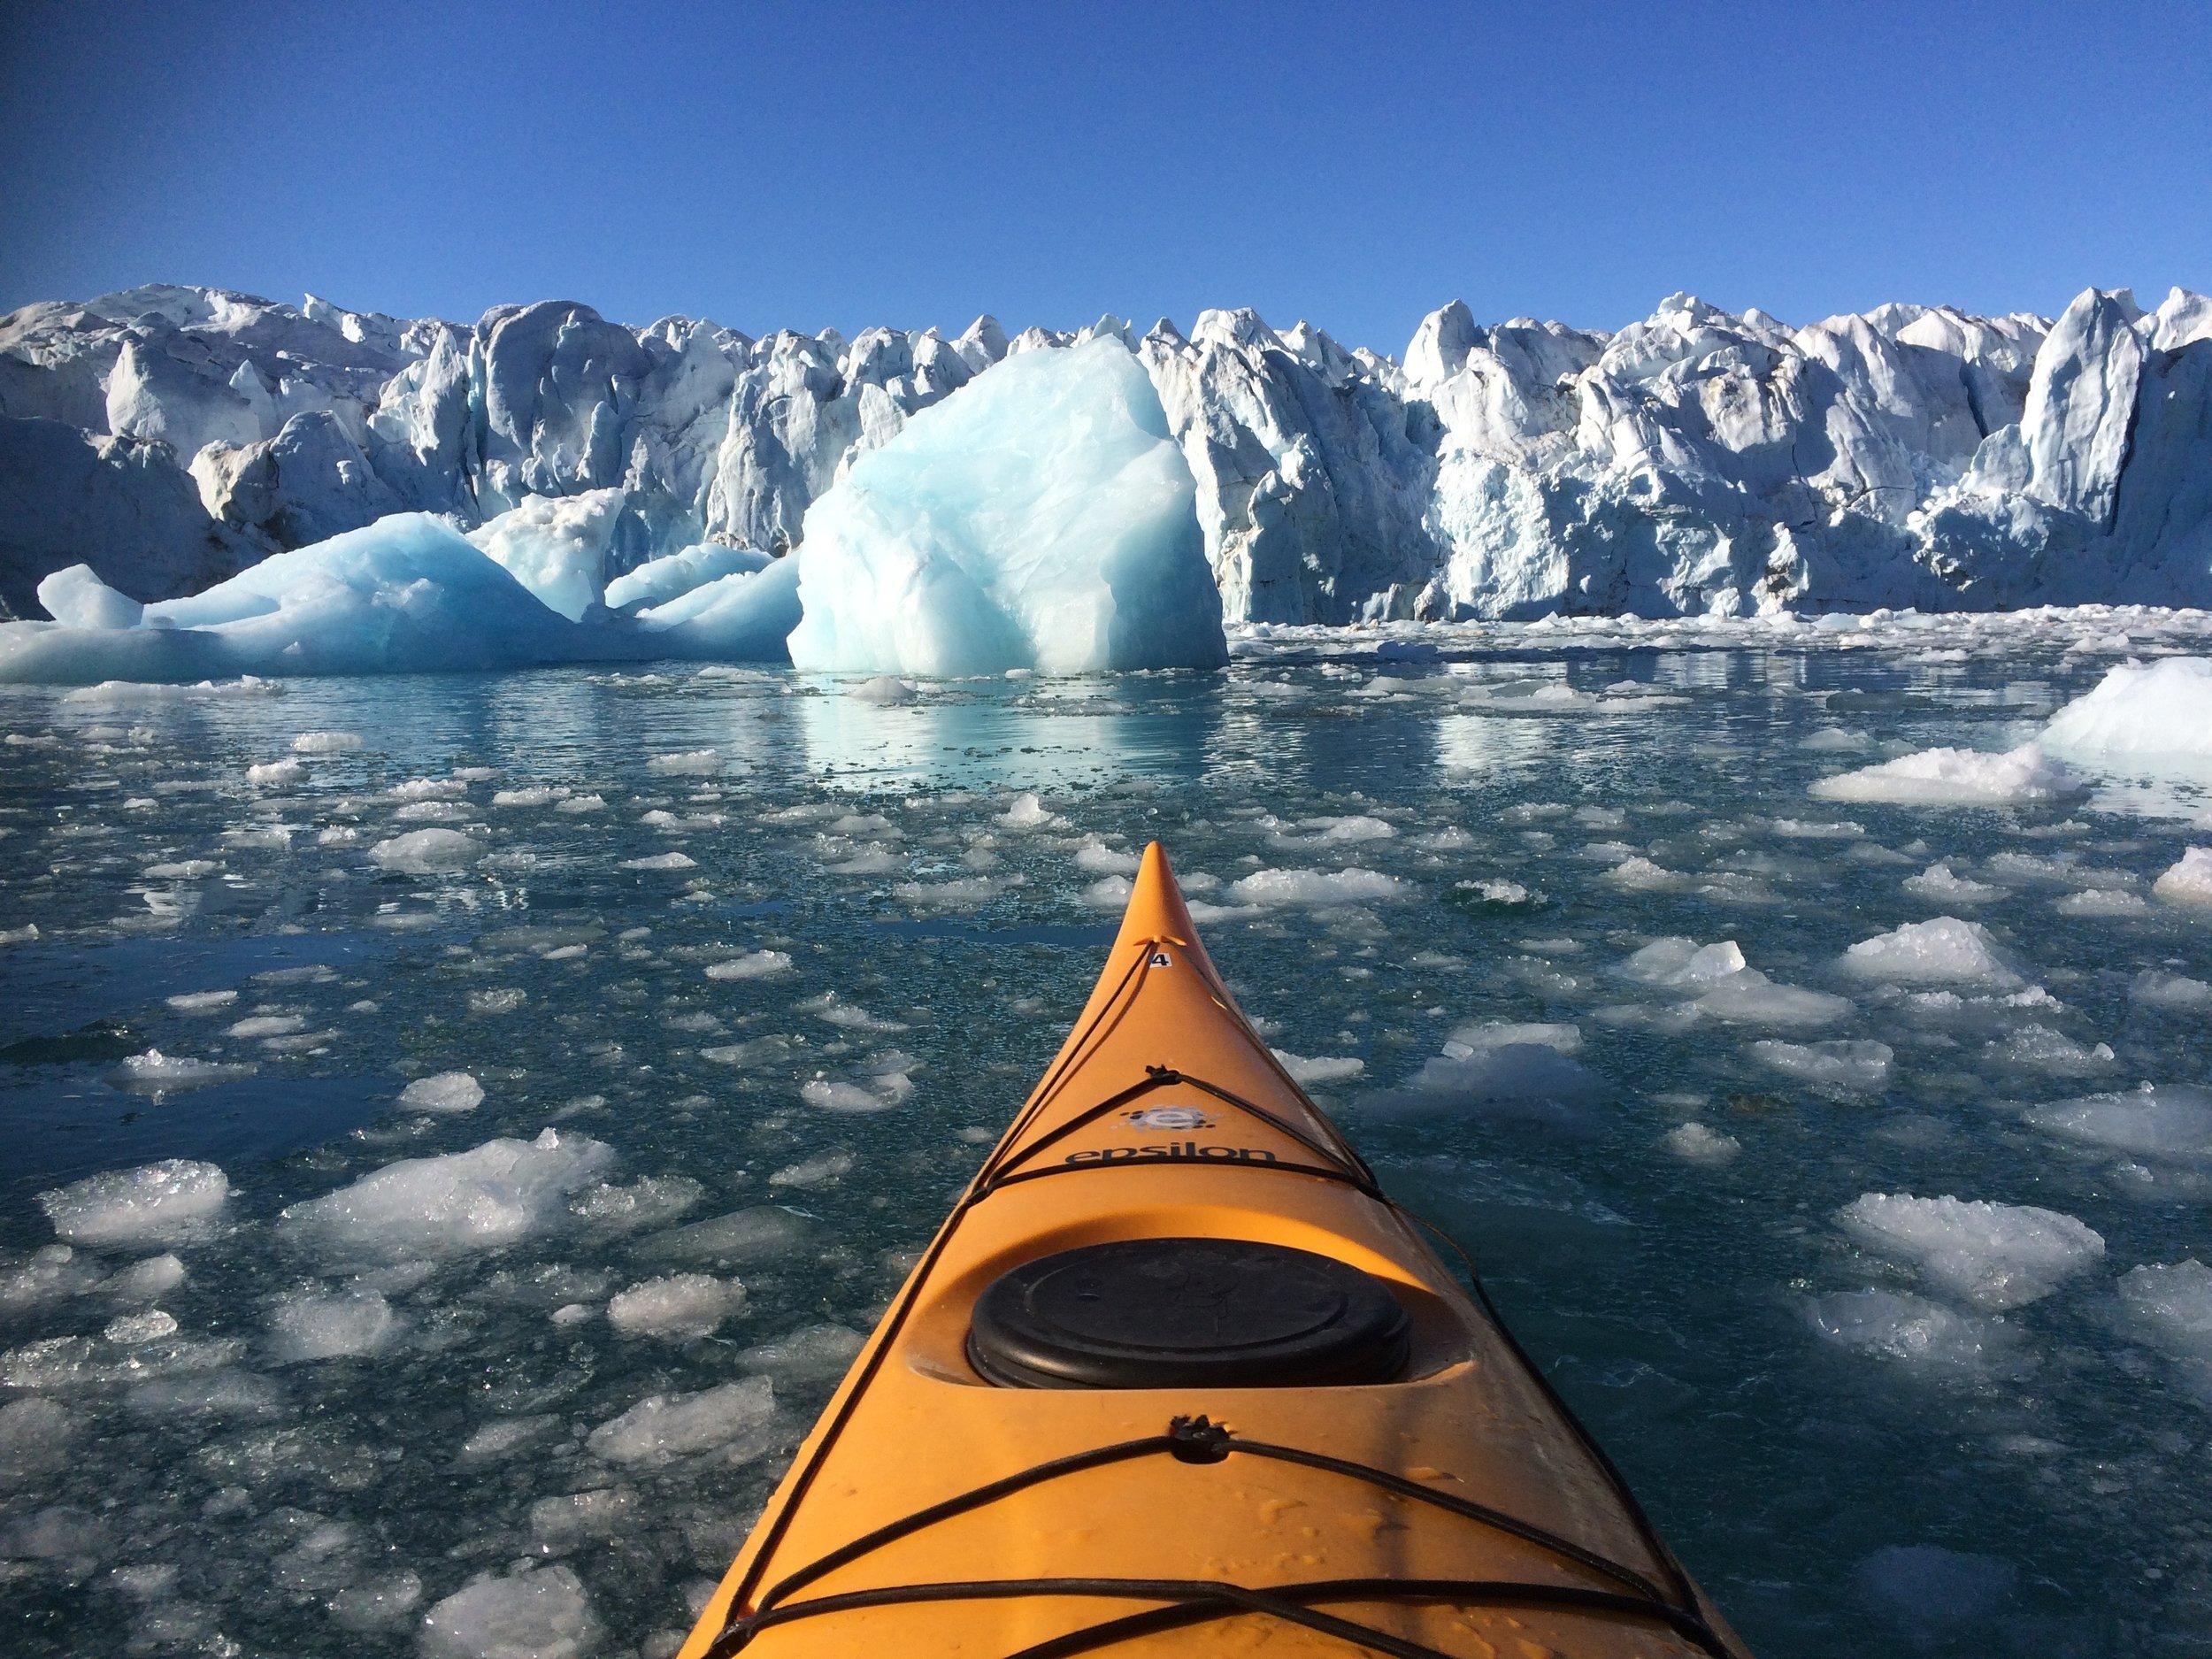 Sea Kayaking in Antarctica - OOE